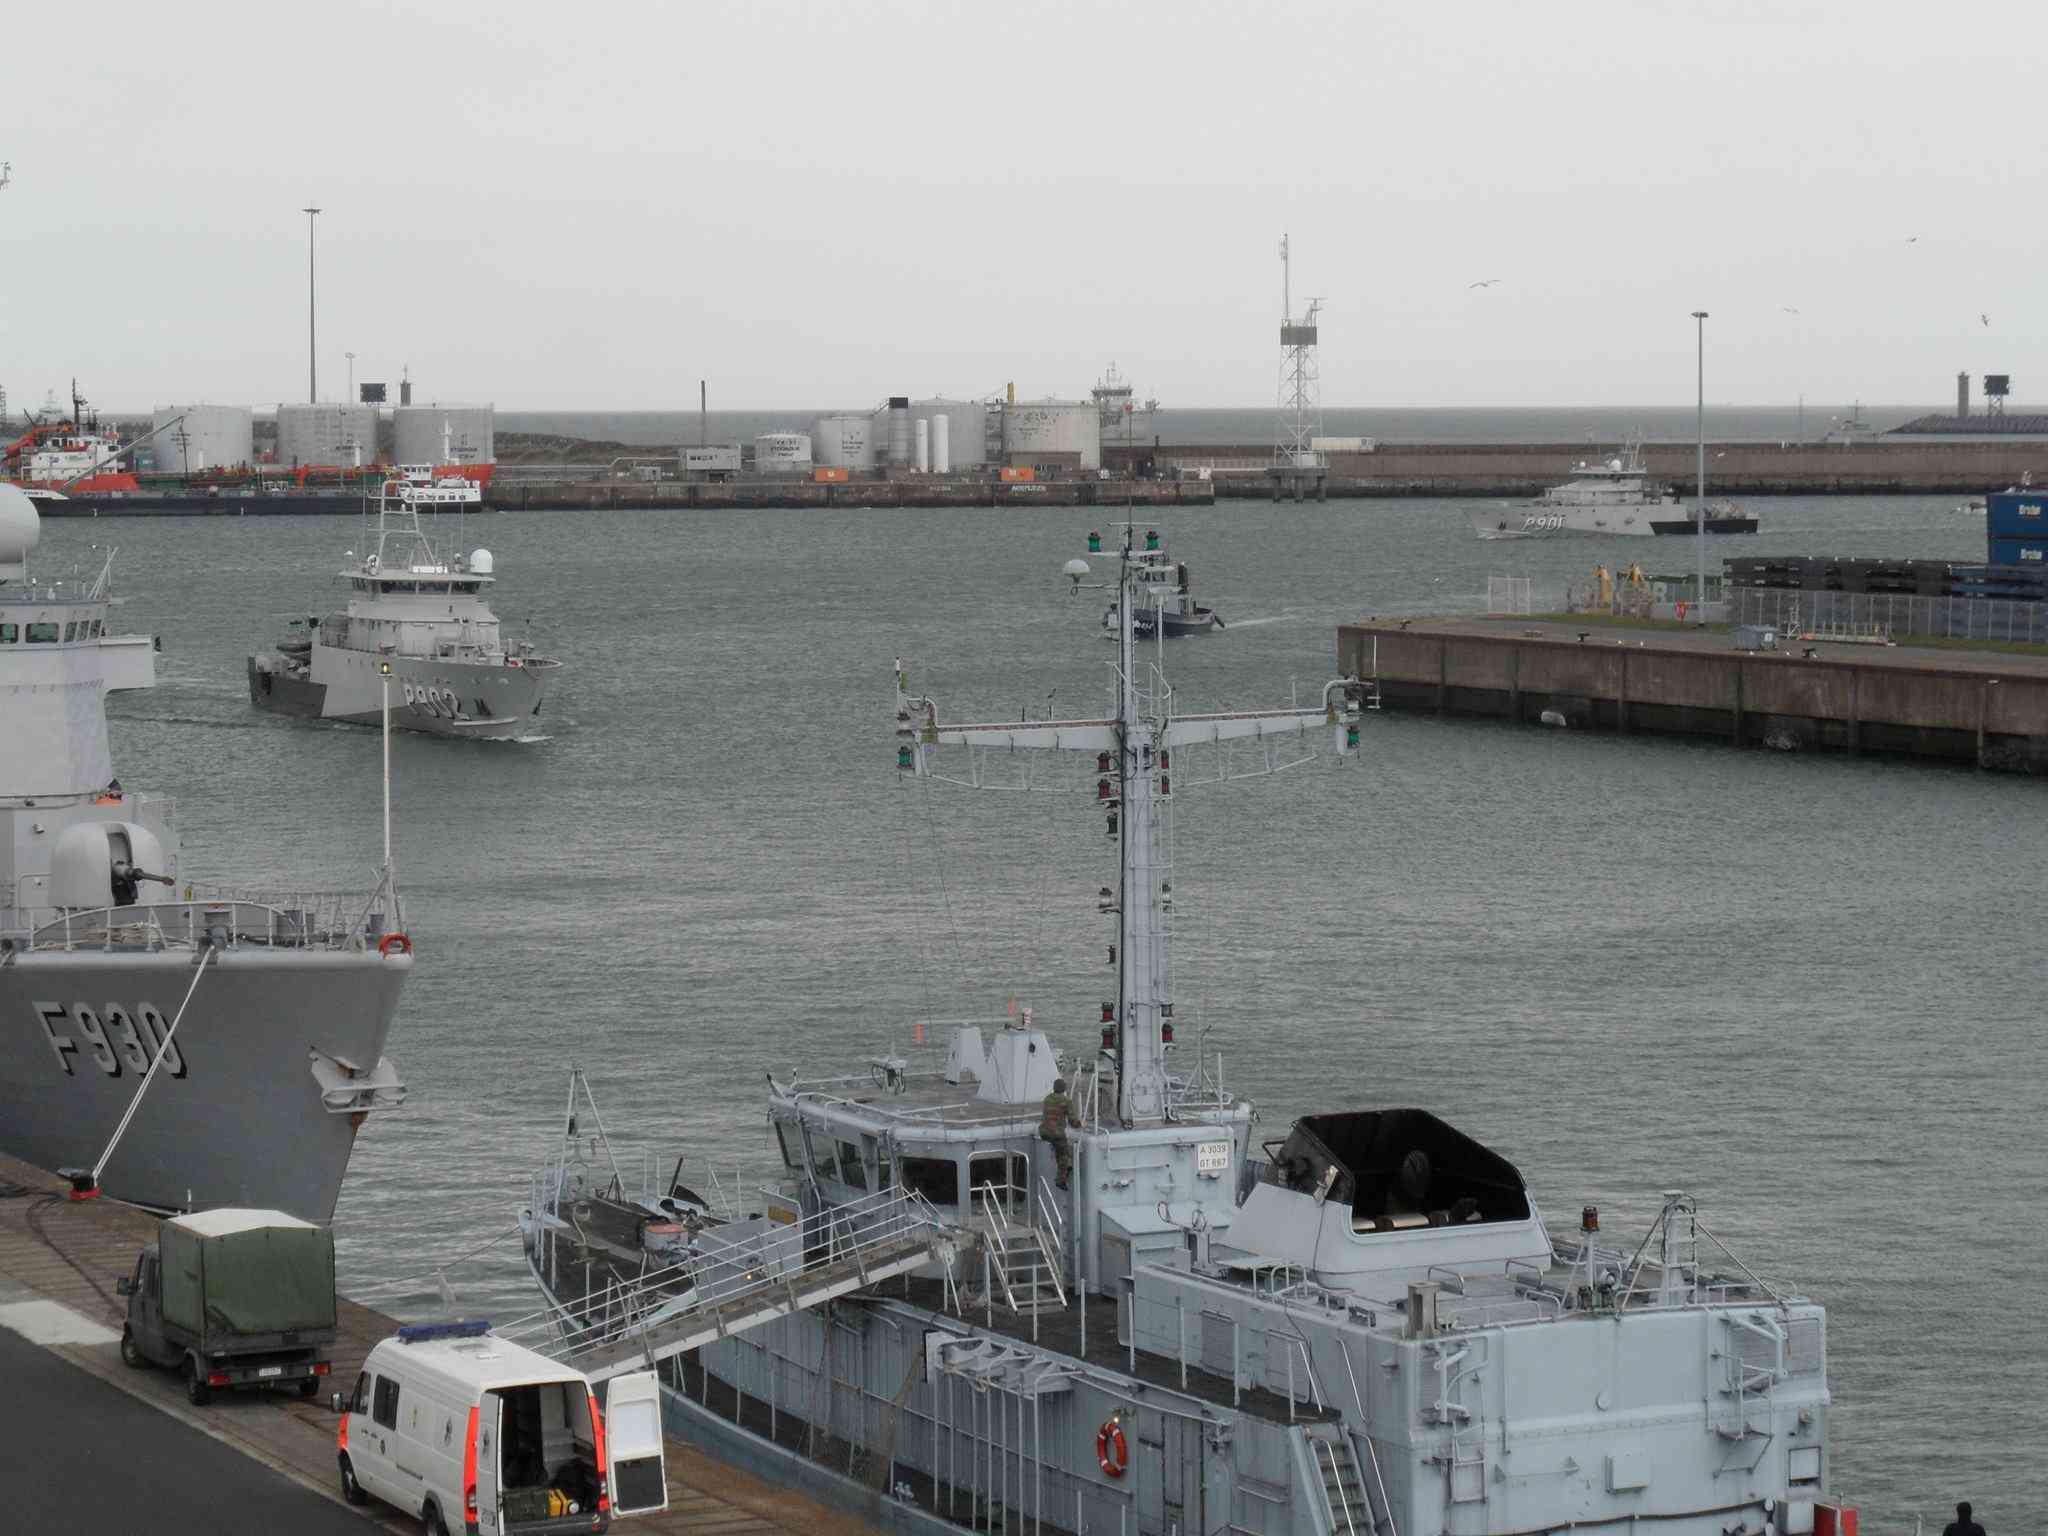 Arrivée du P902 POLLUX à Zeebrugge 11155110